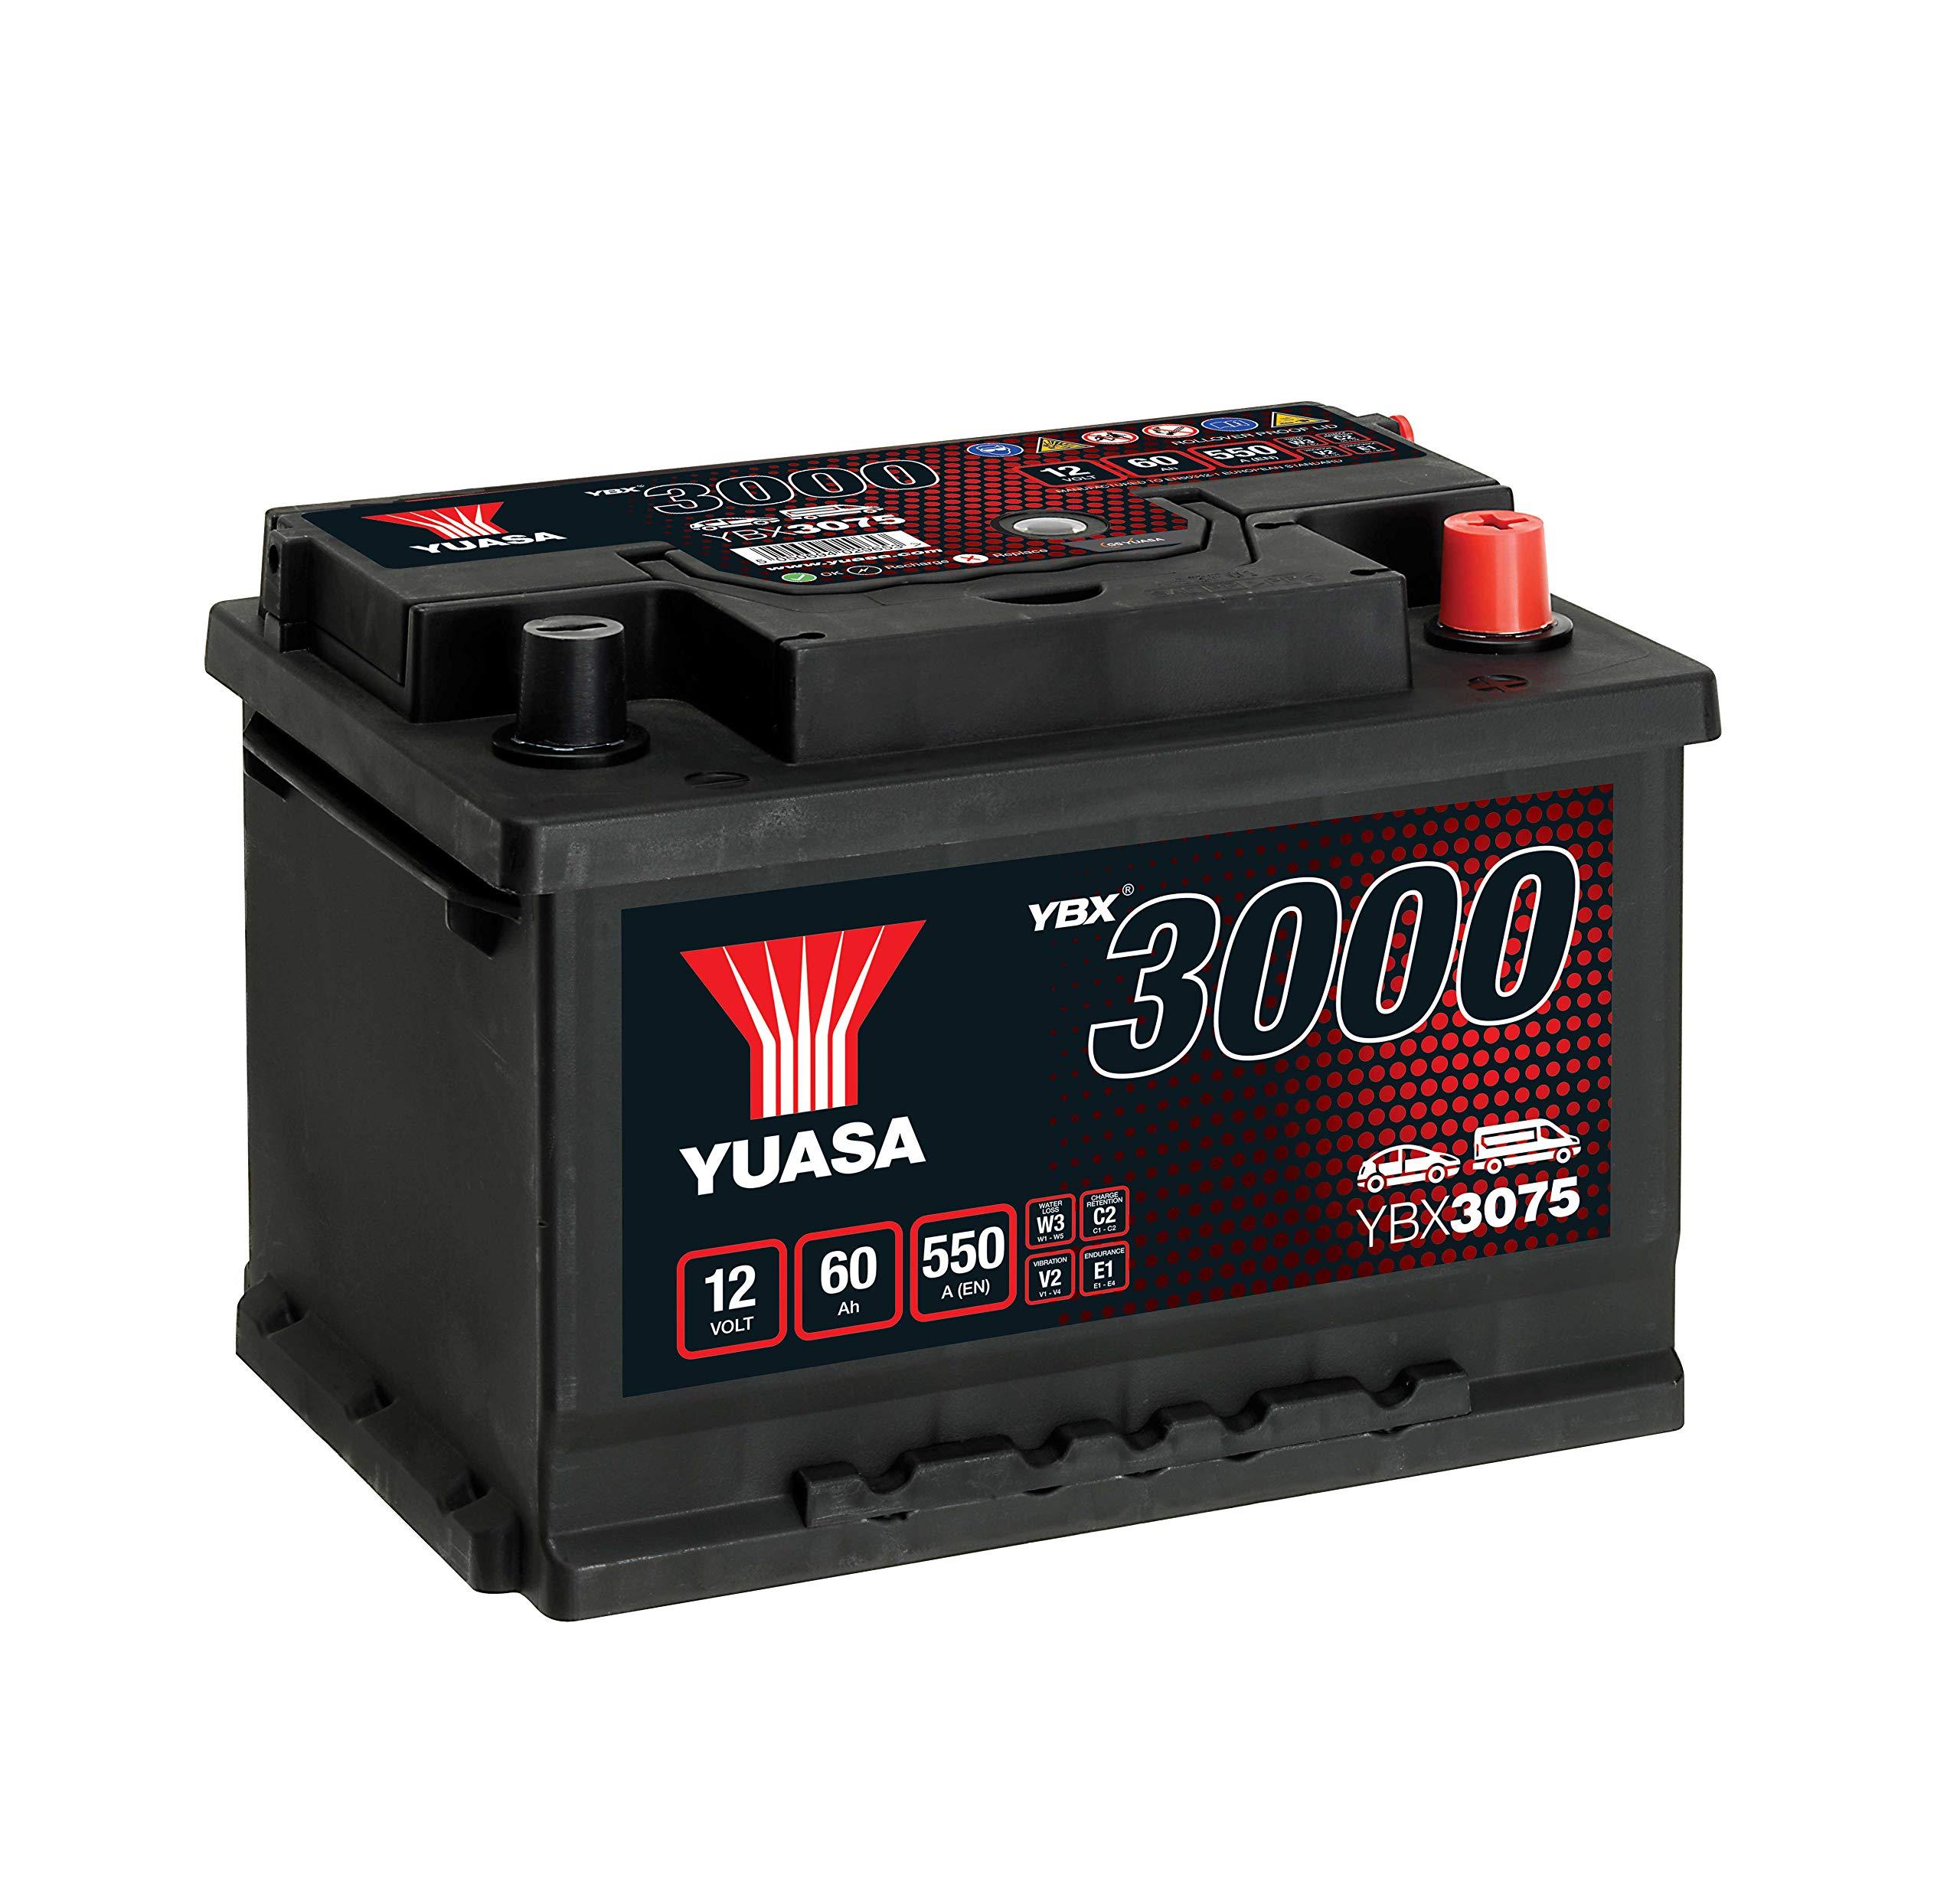 Yuasa YBX3075 12V 60Ah 550A SMF Battery